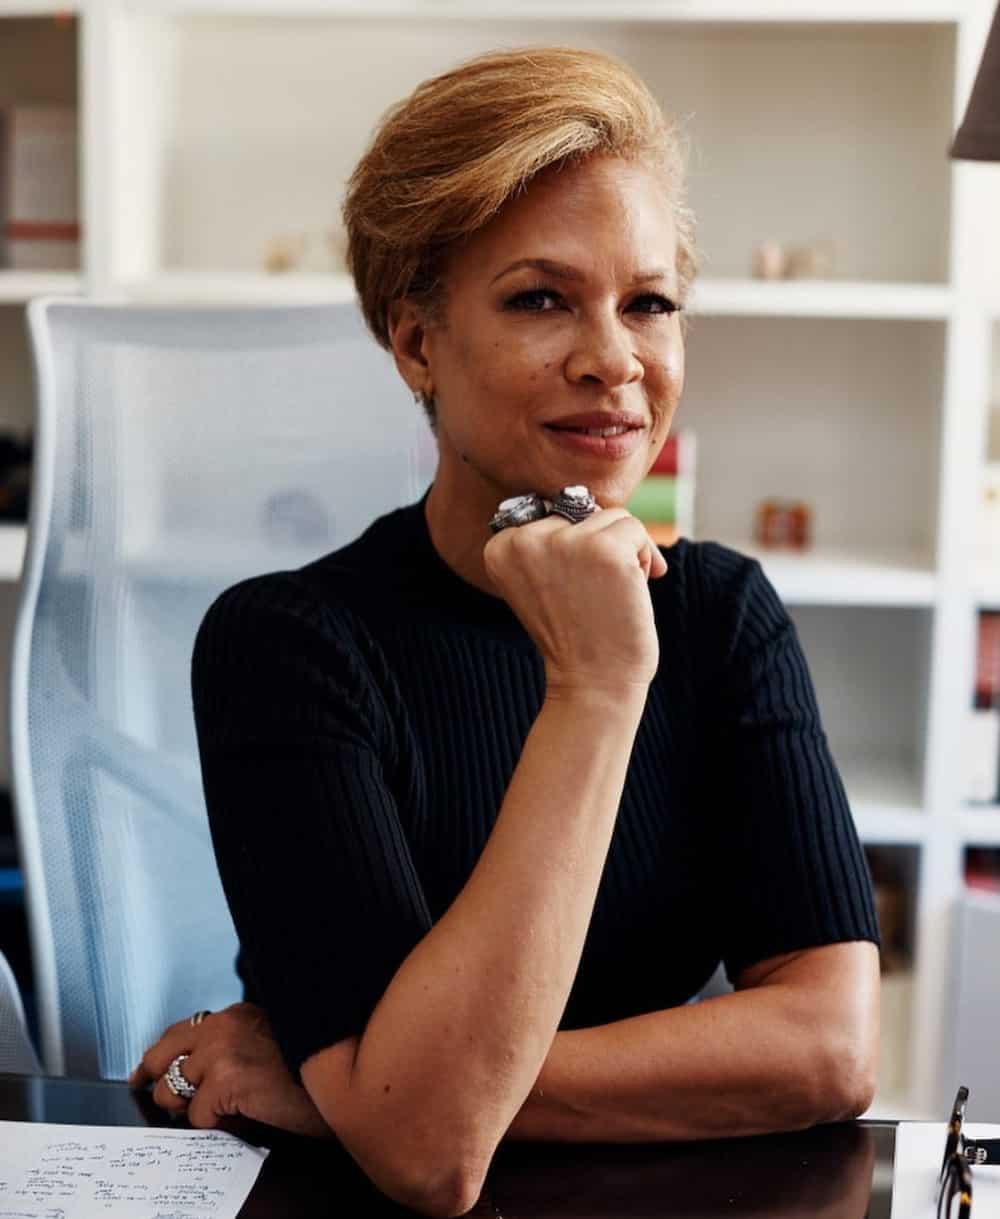 Tonya Lewis Lee bio: husband, age, kids, net worth, and photos